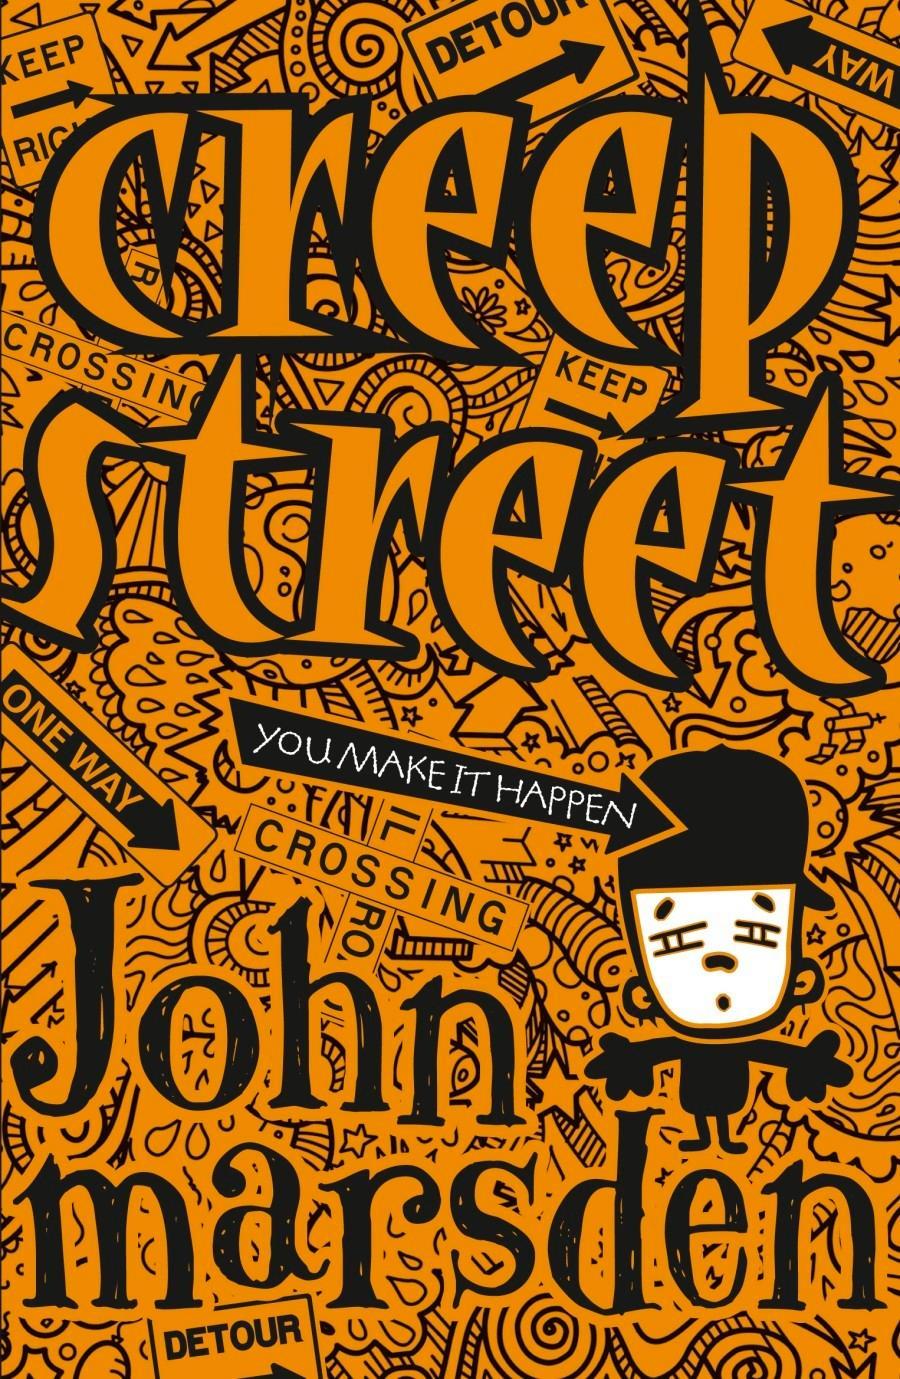 CreepStreet